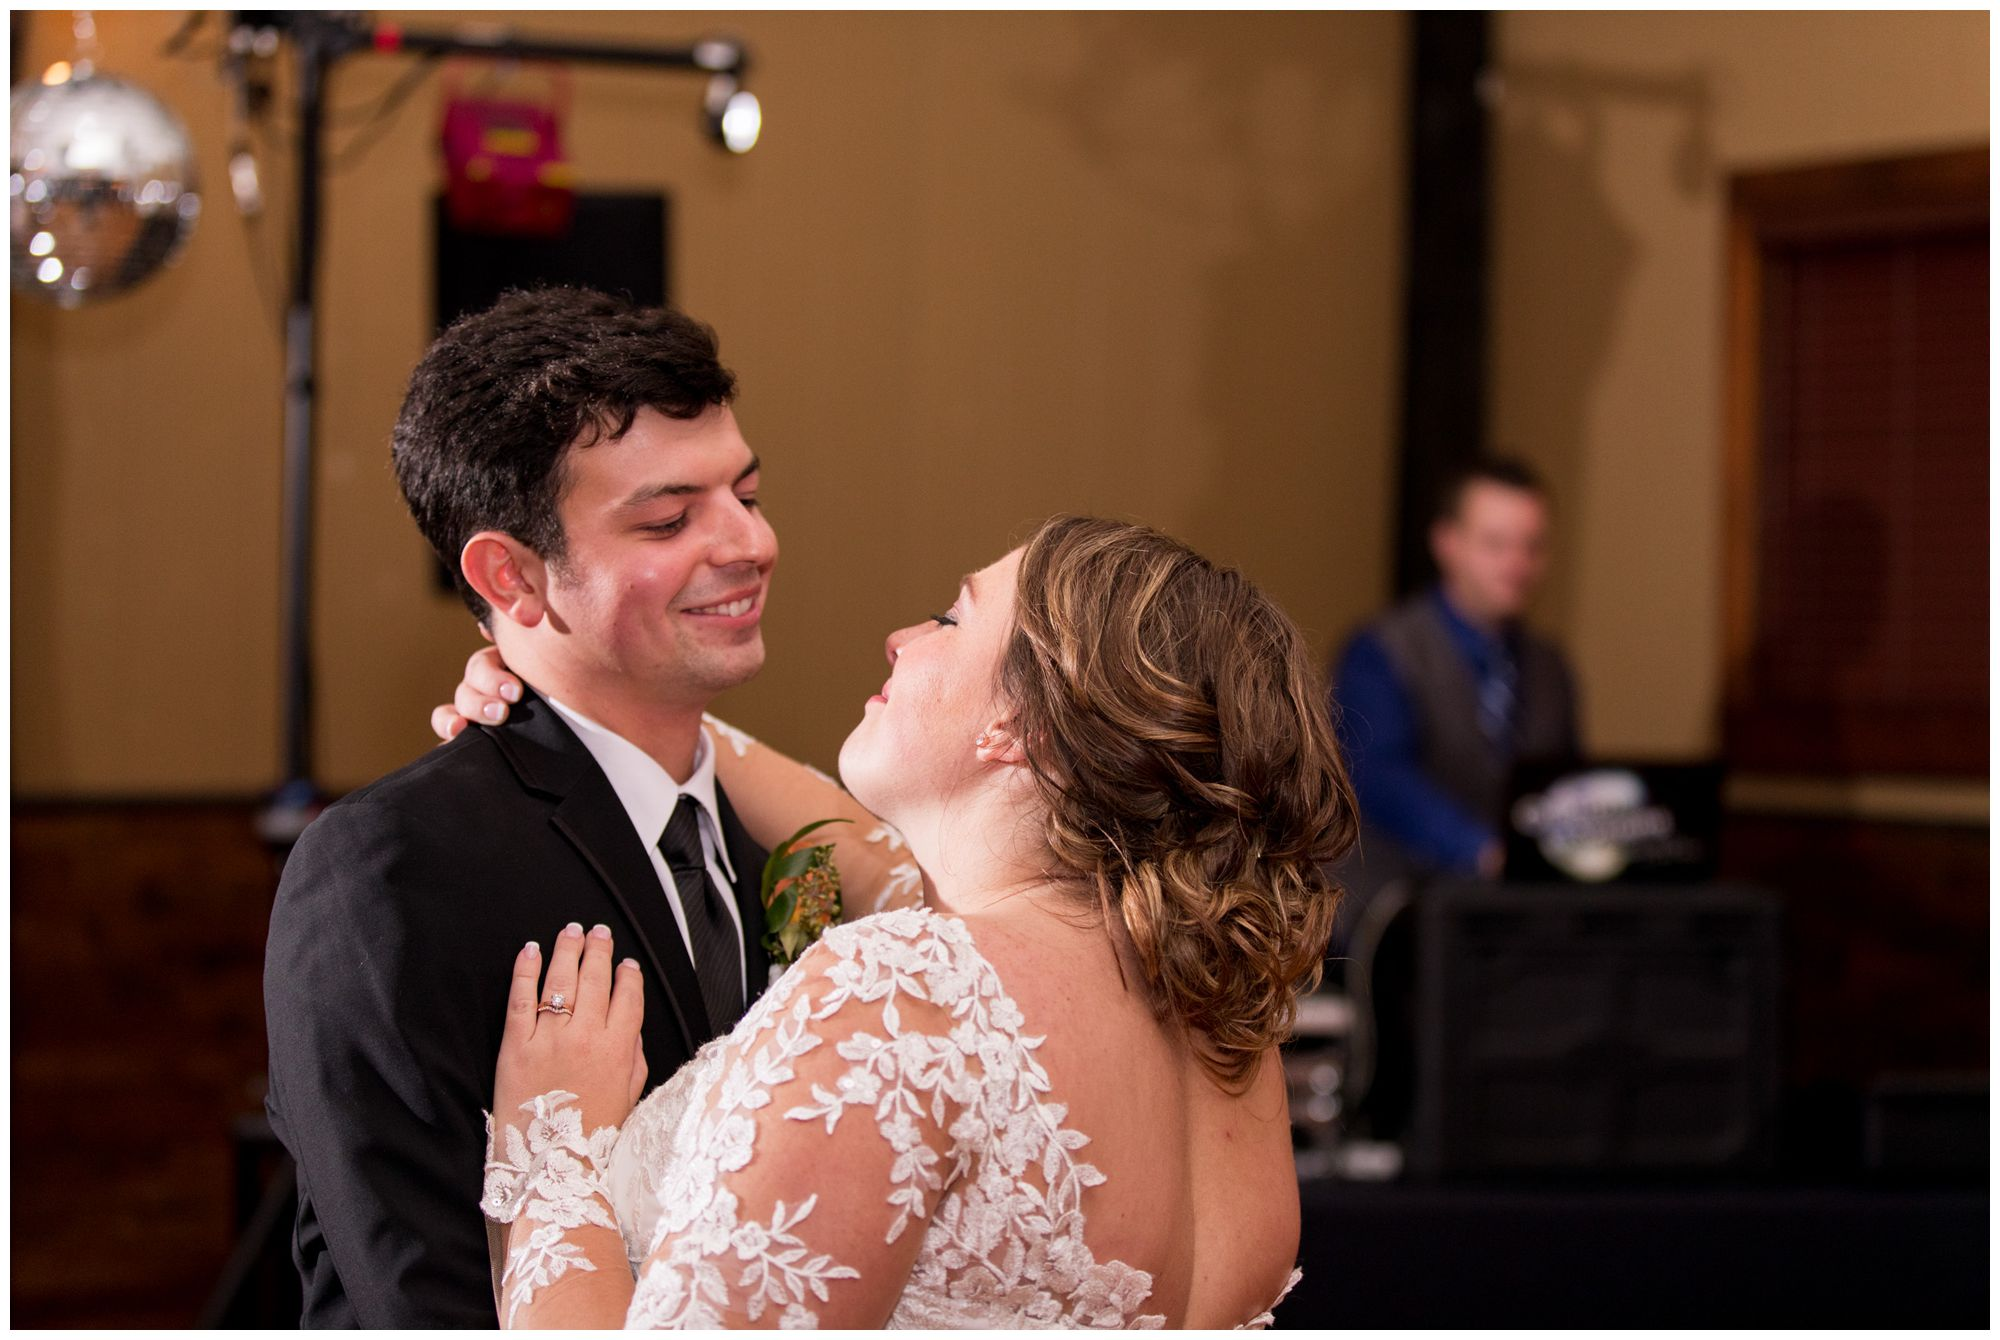 bride and groom first dance during Fort Wayne wedding reception at Goeglein Homestead